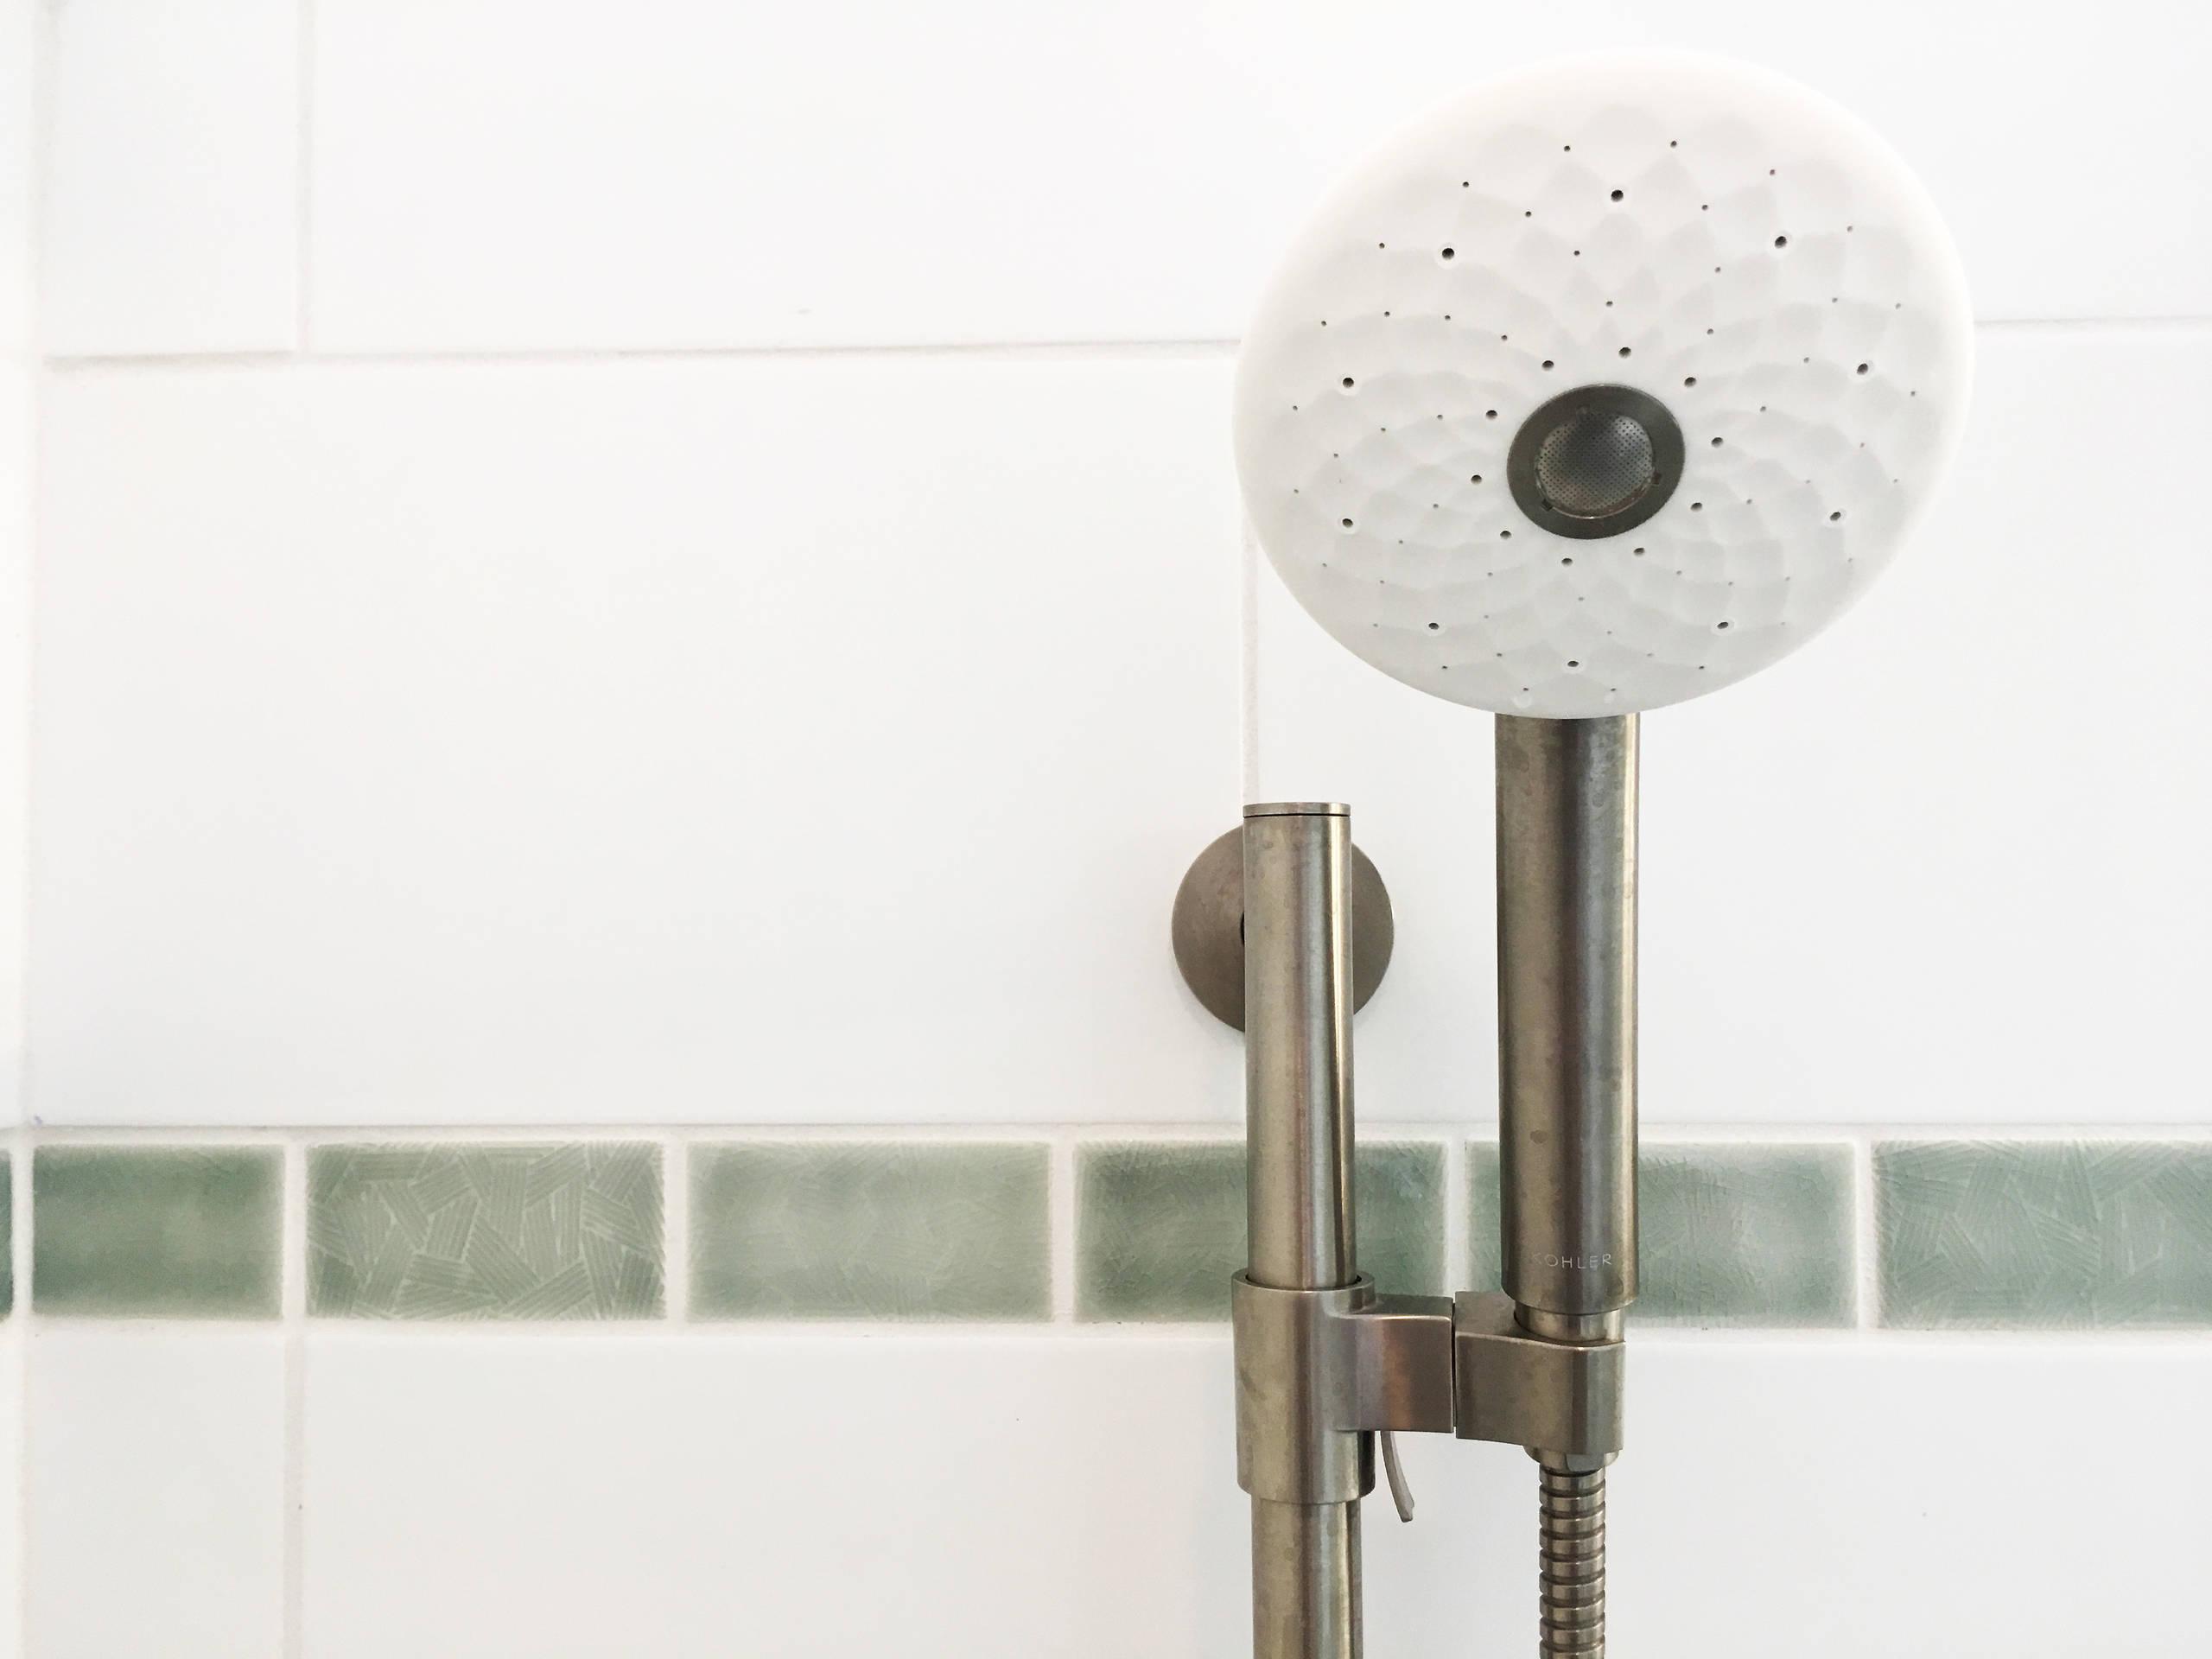 American Four Square Remodel, Shorewood, WI. Master Bathroom.